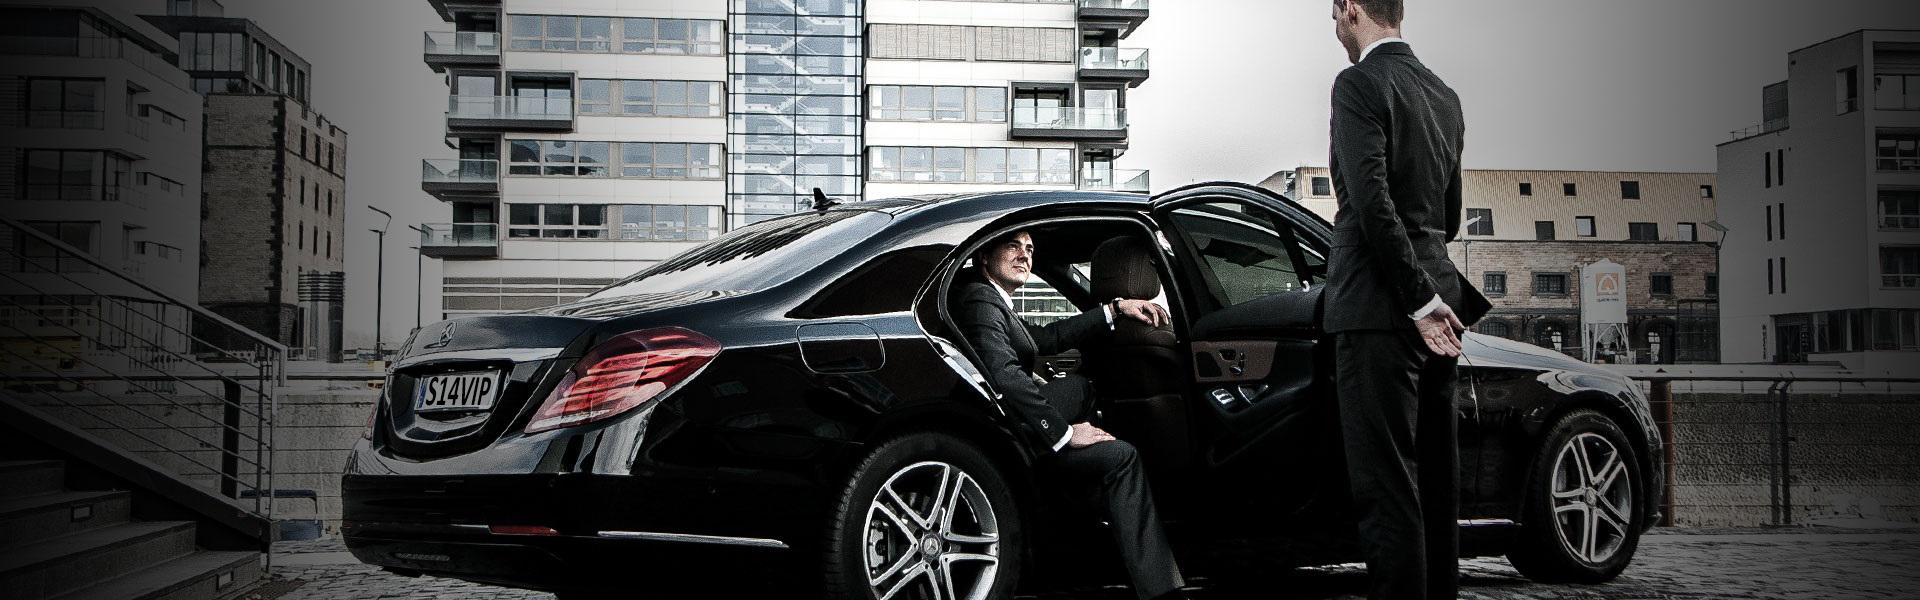 bl-slider-chauffeur-opening-limousine-door-for-businessman2-1